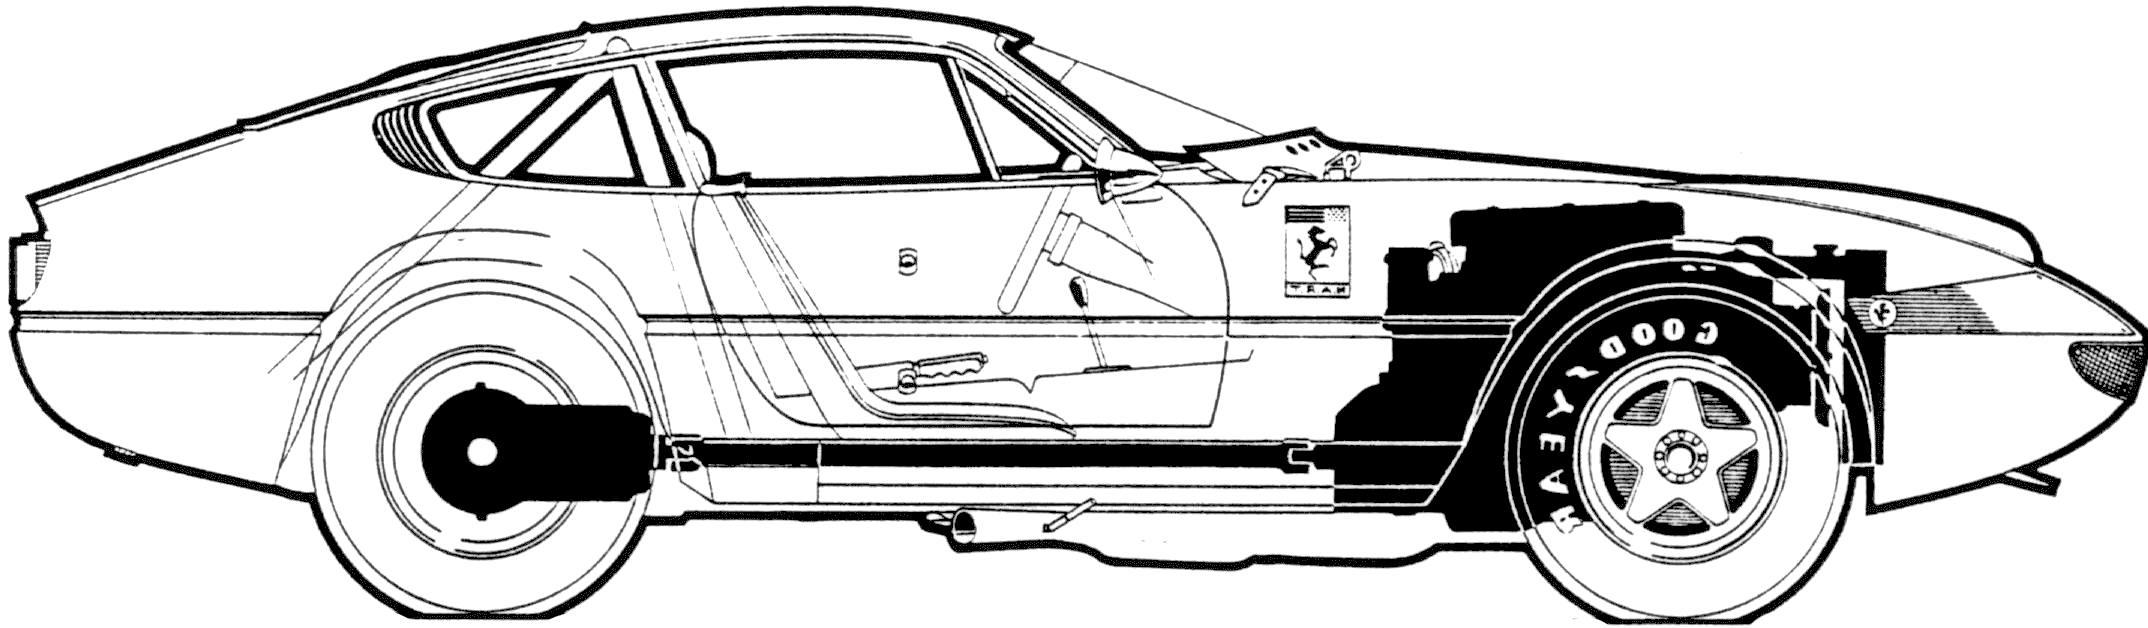 Wallpaper  drawing, illustration, vehicle, cartoon, Ferrari